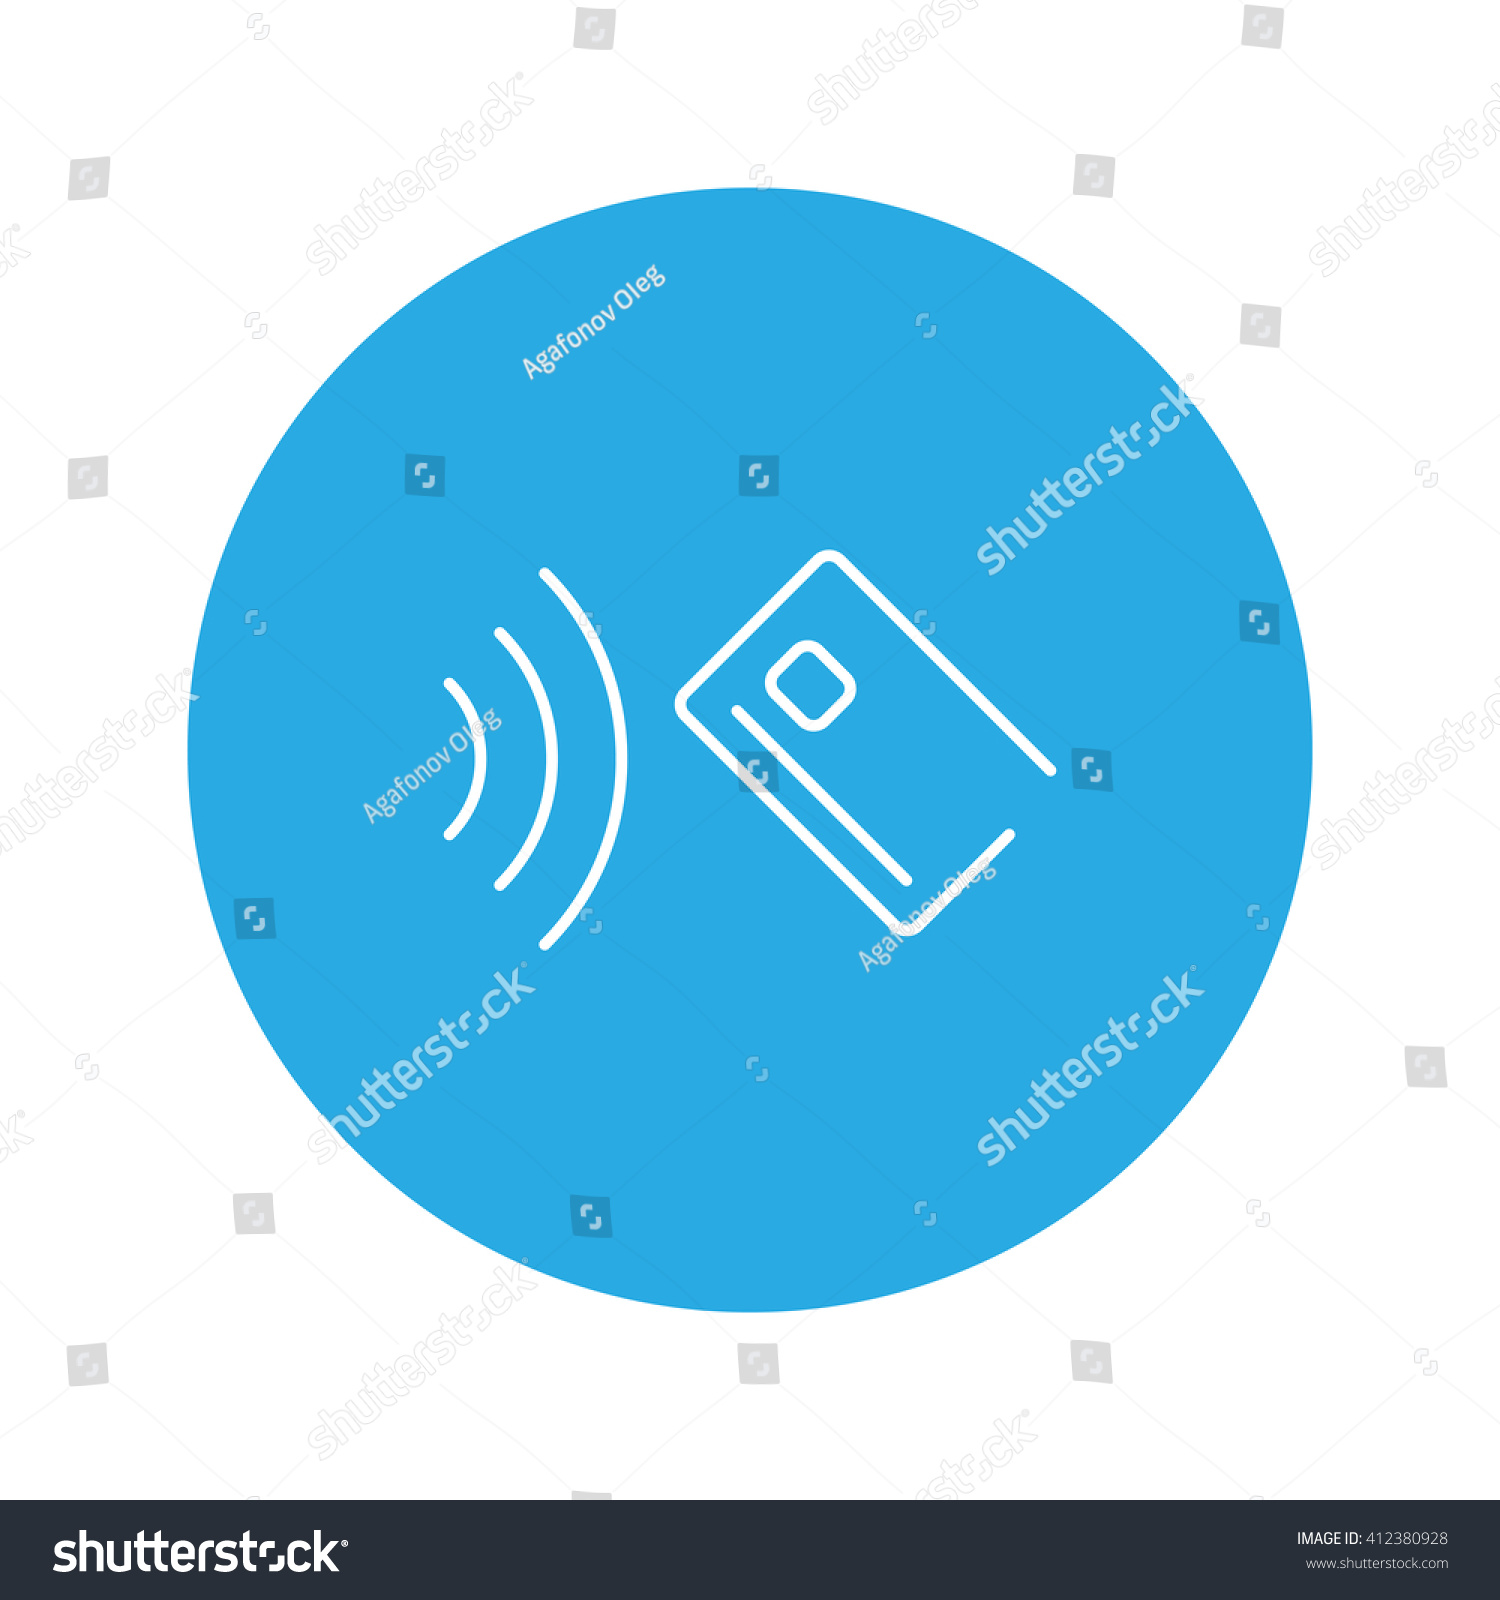 Master card icon visa card icon stock vector 412380928 shutterstock master card icon visa card icon payment method icon payment method symbol biocorpaavc Choice Image